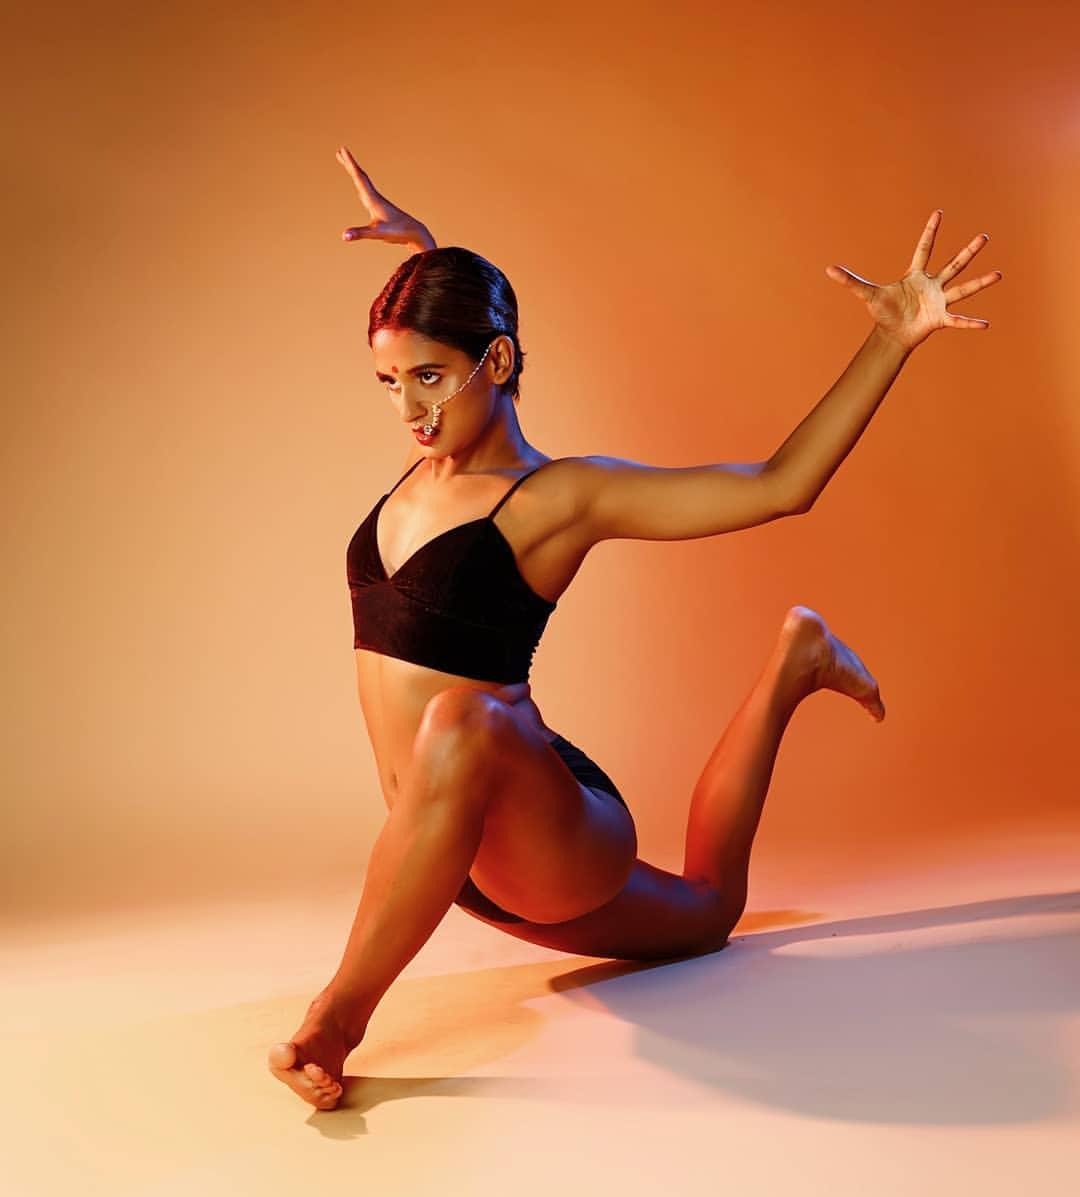 shakti-mohan-in-bikini-showing-dance-pose